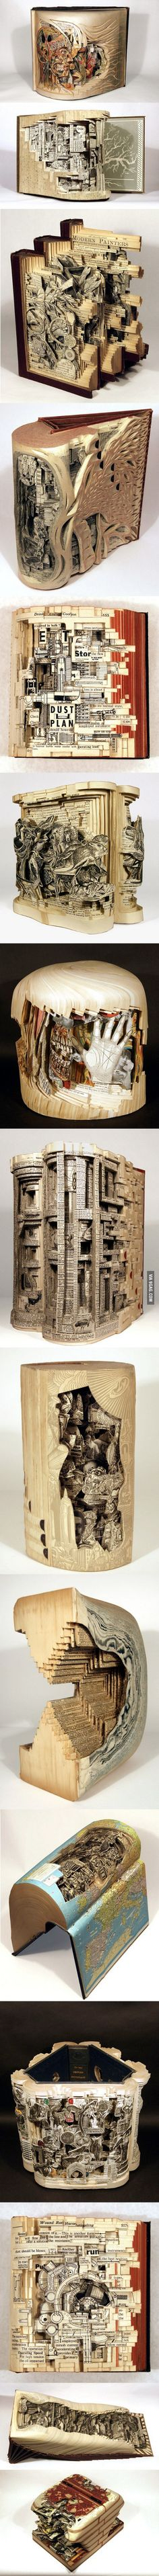 Book art - terrible thing to do to a book, but really beautiful art. Book Sculpture, Sculptures, Altered Books, Amazing Art, Artist Books, Sculpture, Art, Paper Art, Altered Art